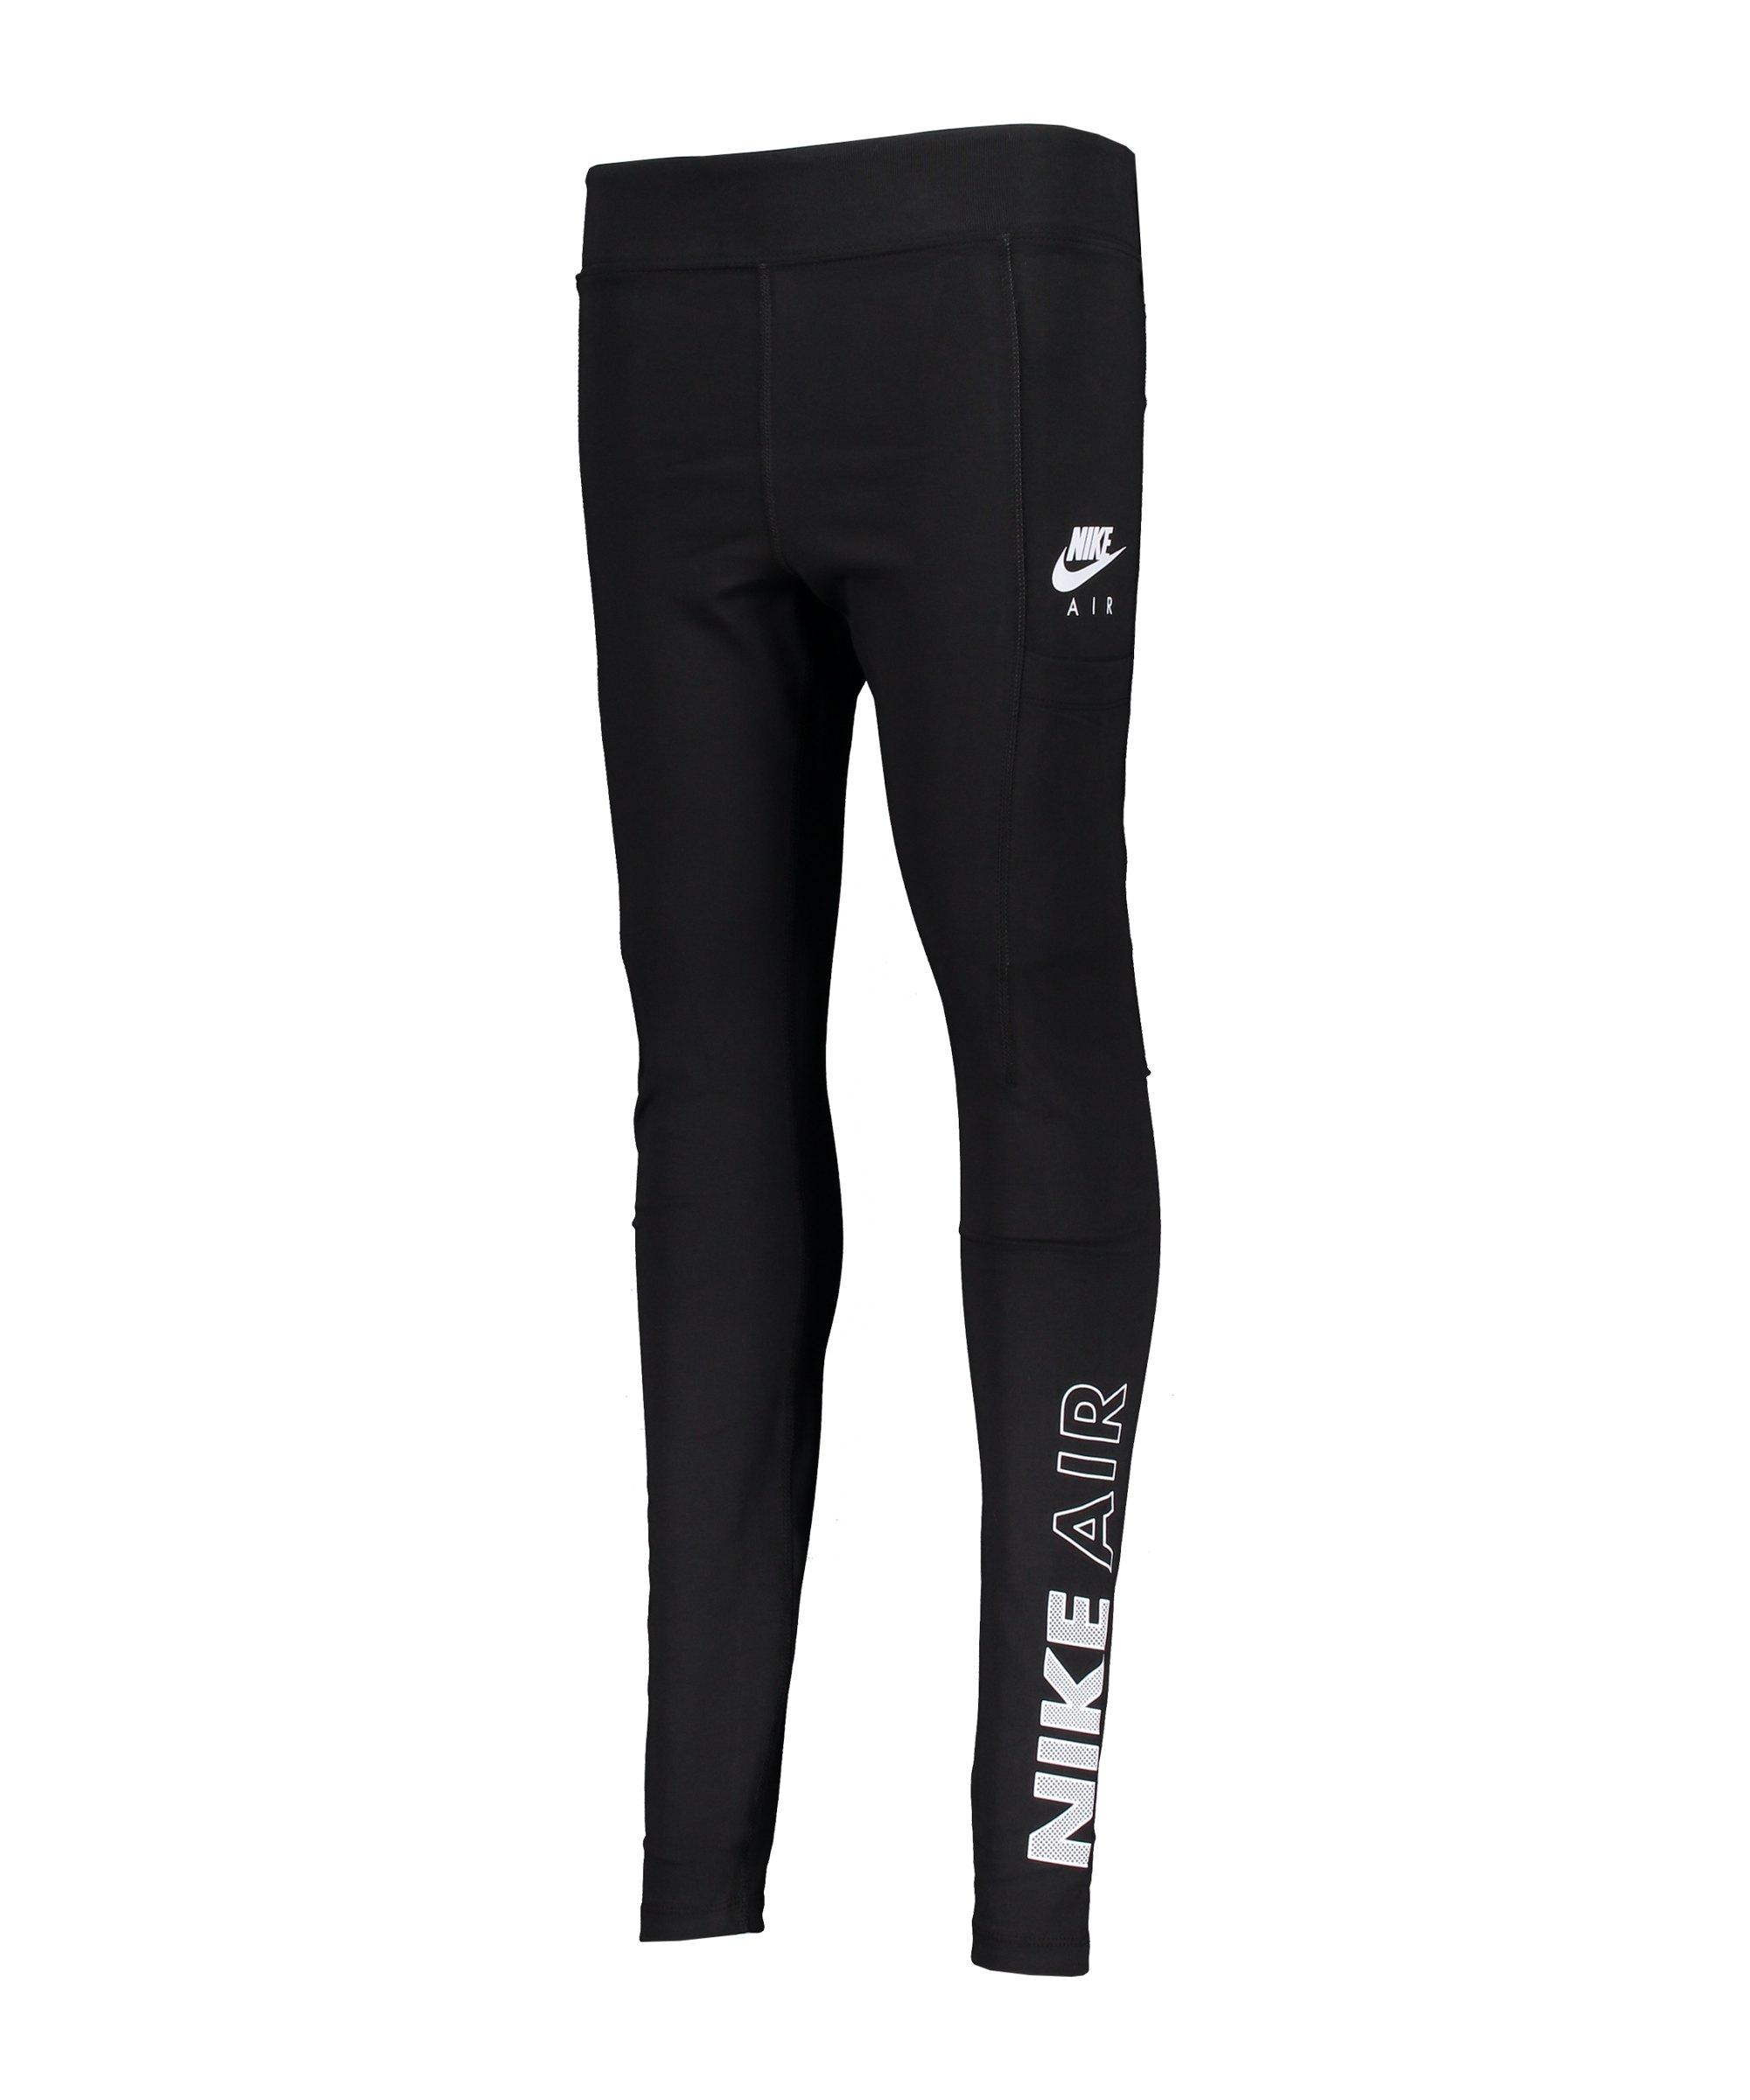 Nike Air Leggings Damen Schwarz Weiss F010 - schwarz